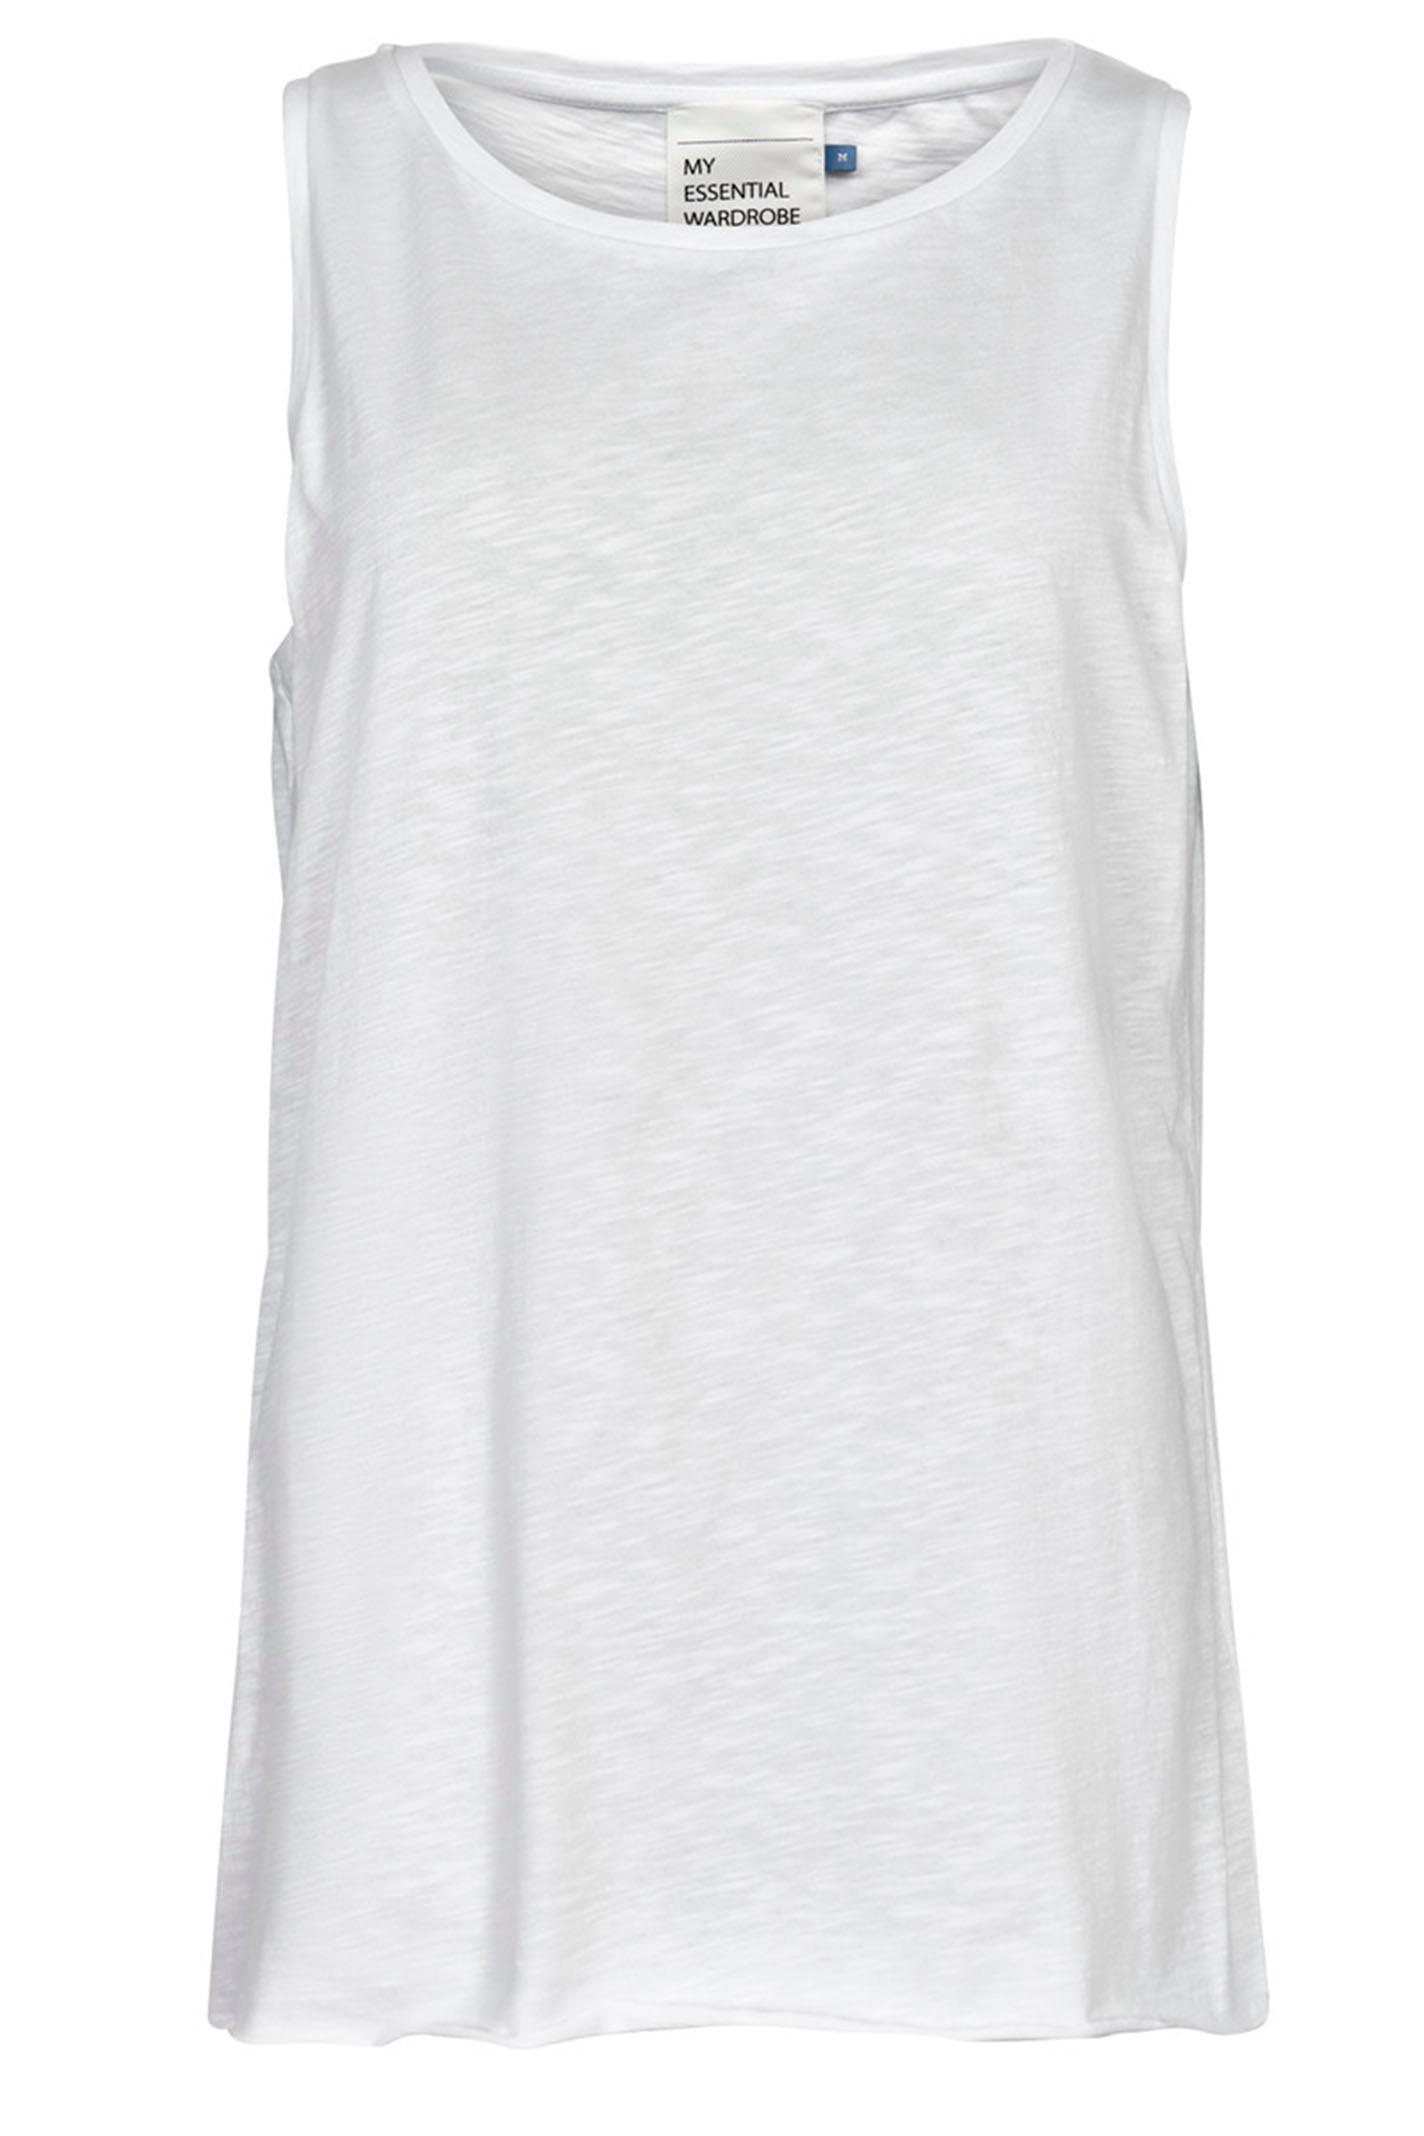 DENIM HUNTER 10702679 THE TANK Slub Yarn Jersey Optical White